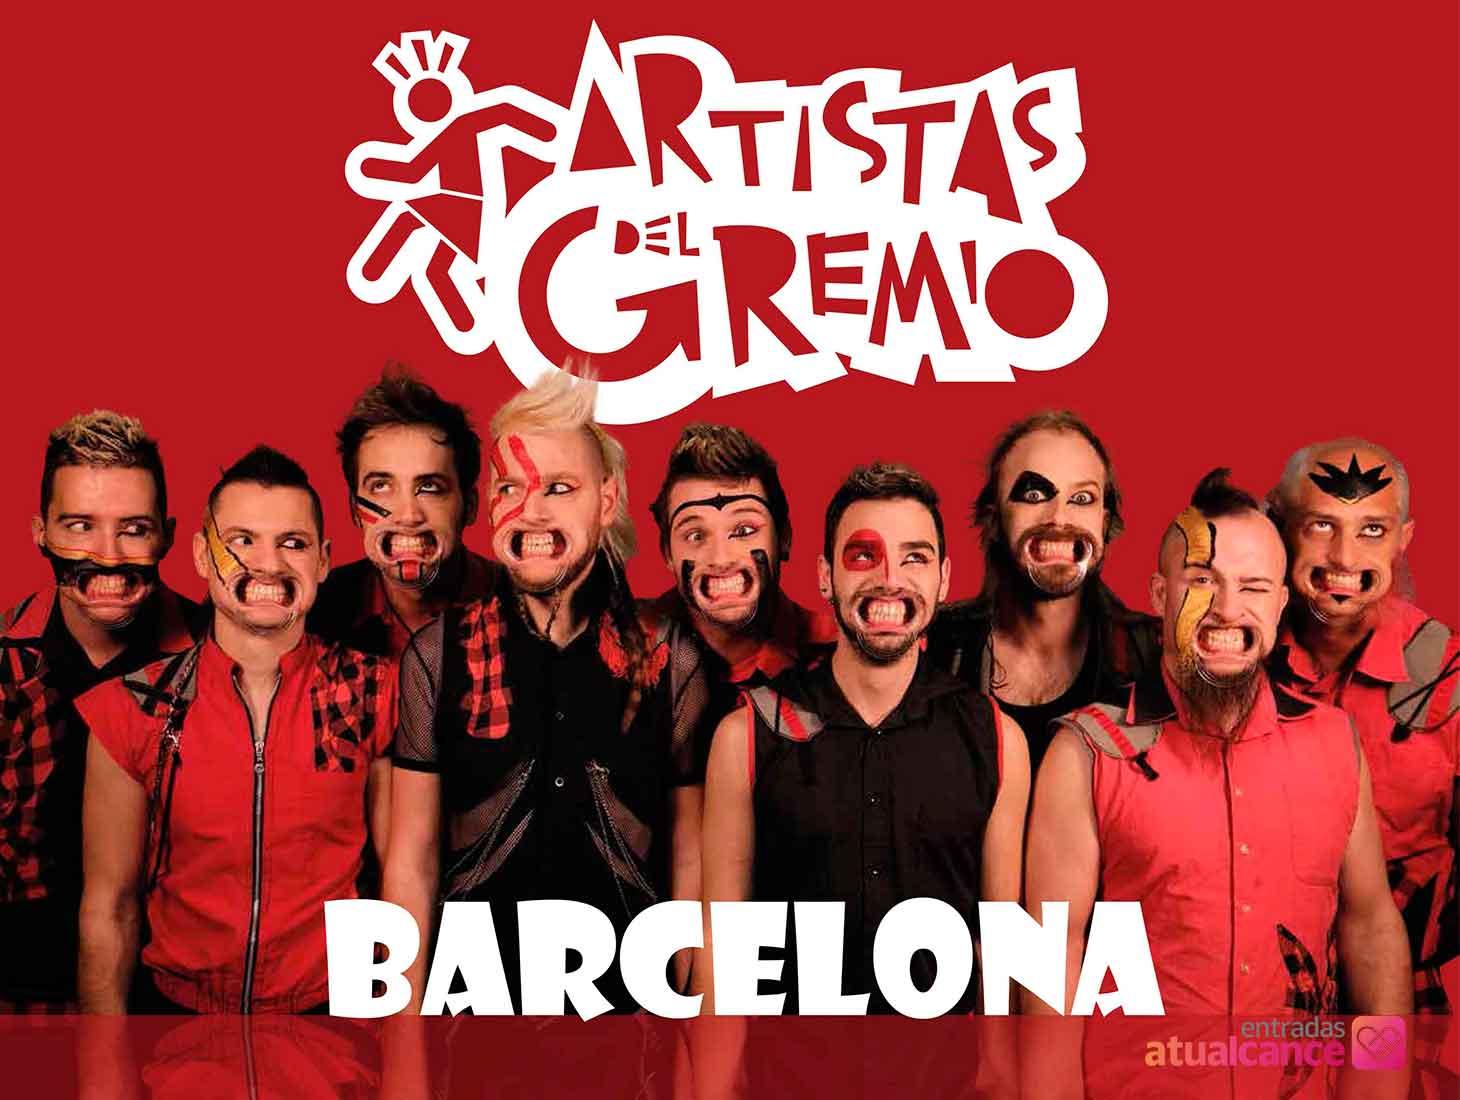 artistas-del-gremio-gps-barcelona-5e1c5ee0338e6.jpeg